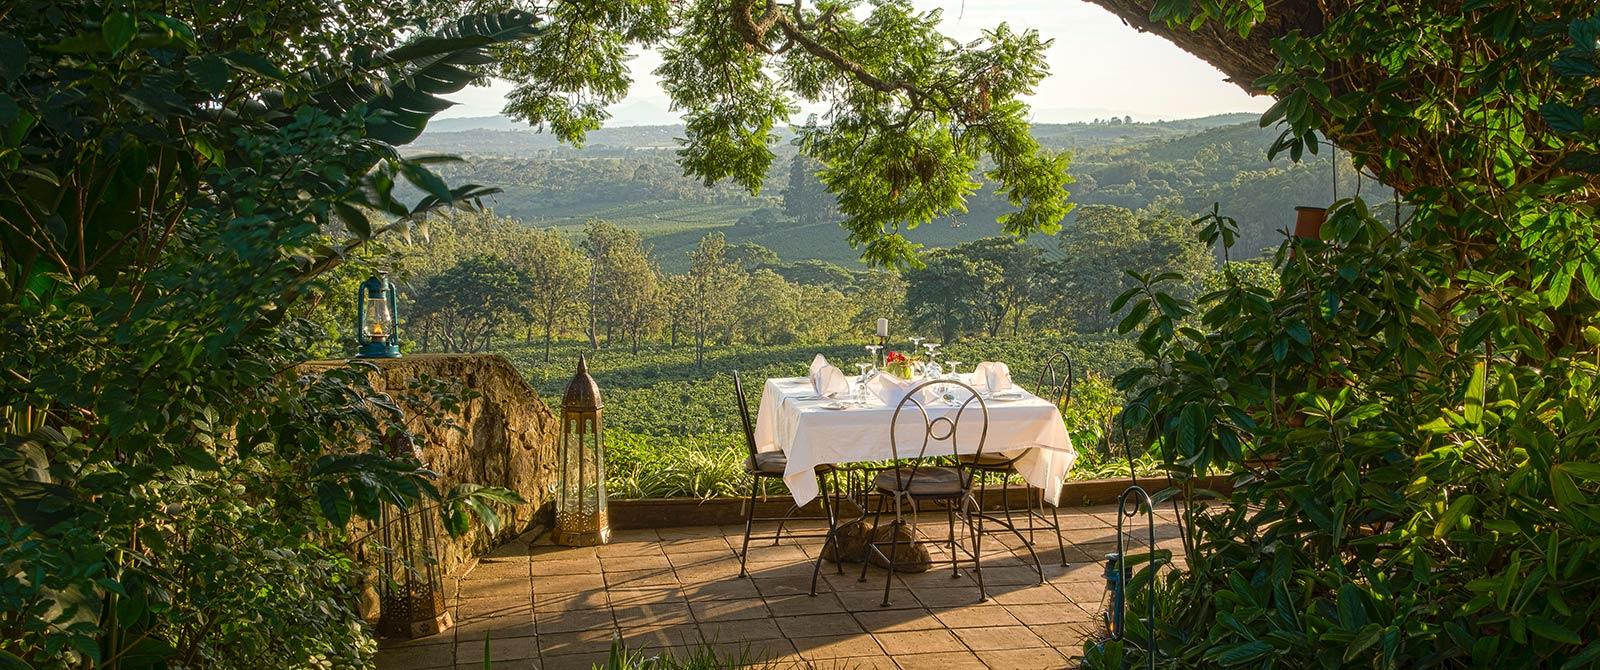 Gibb's Farm Ngorongoro Crater Lake Manyara - Tanzania Highlights: Tarangire, Ngorongoro, and Serengeti Safari